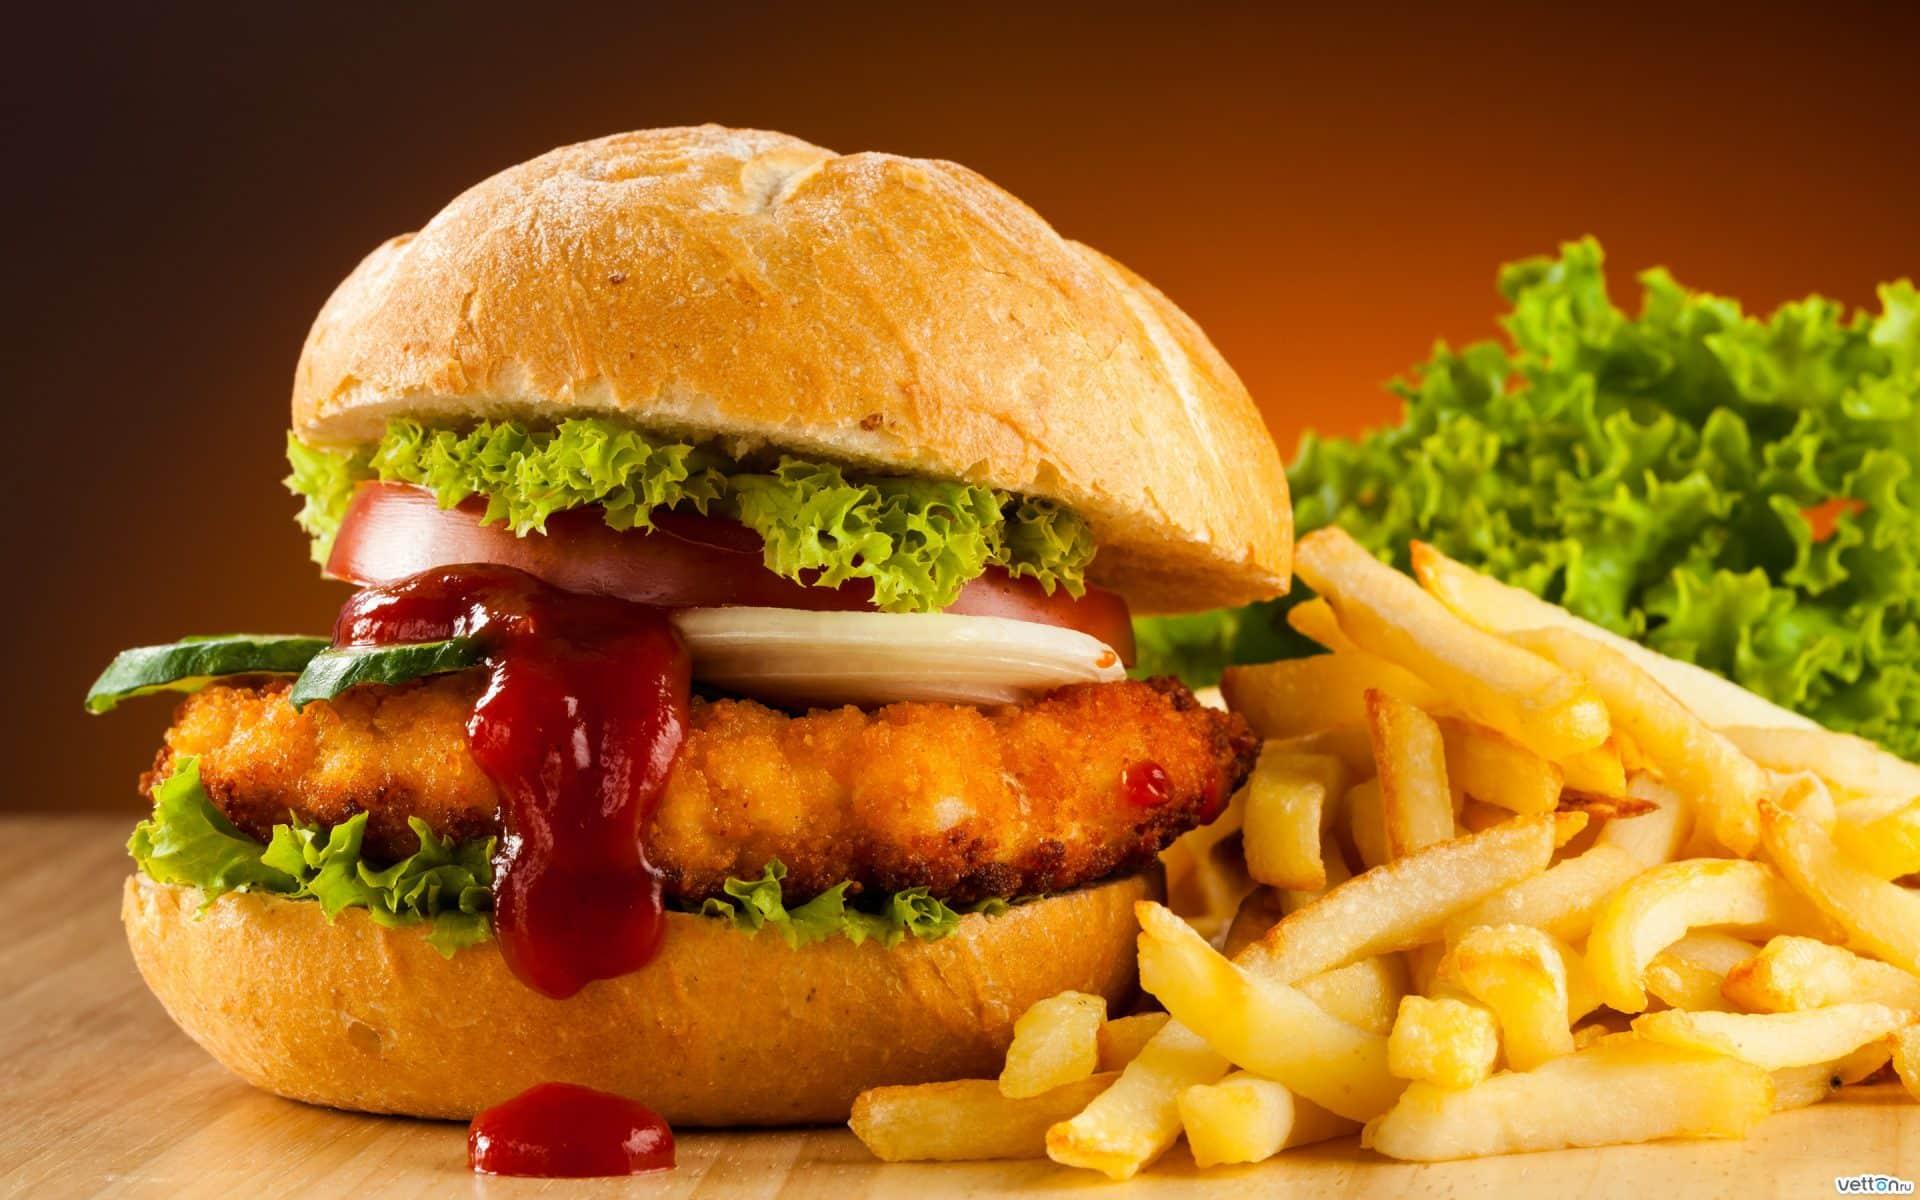 863385284hamburger-fast-food-french-fries-Favim.com-483020